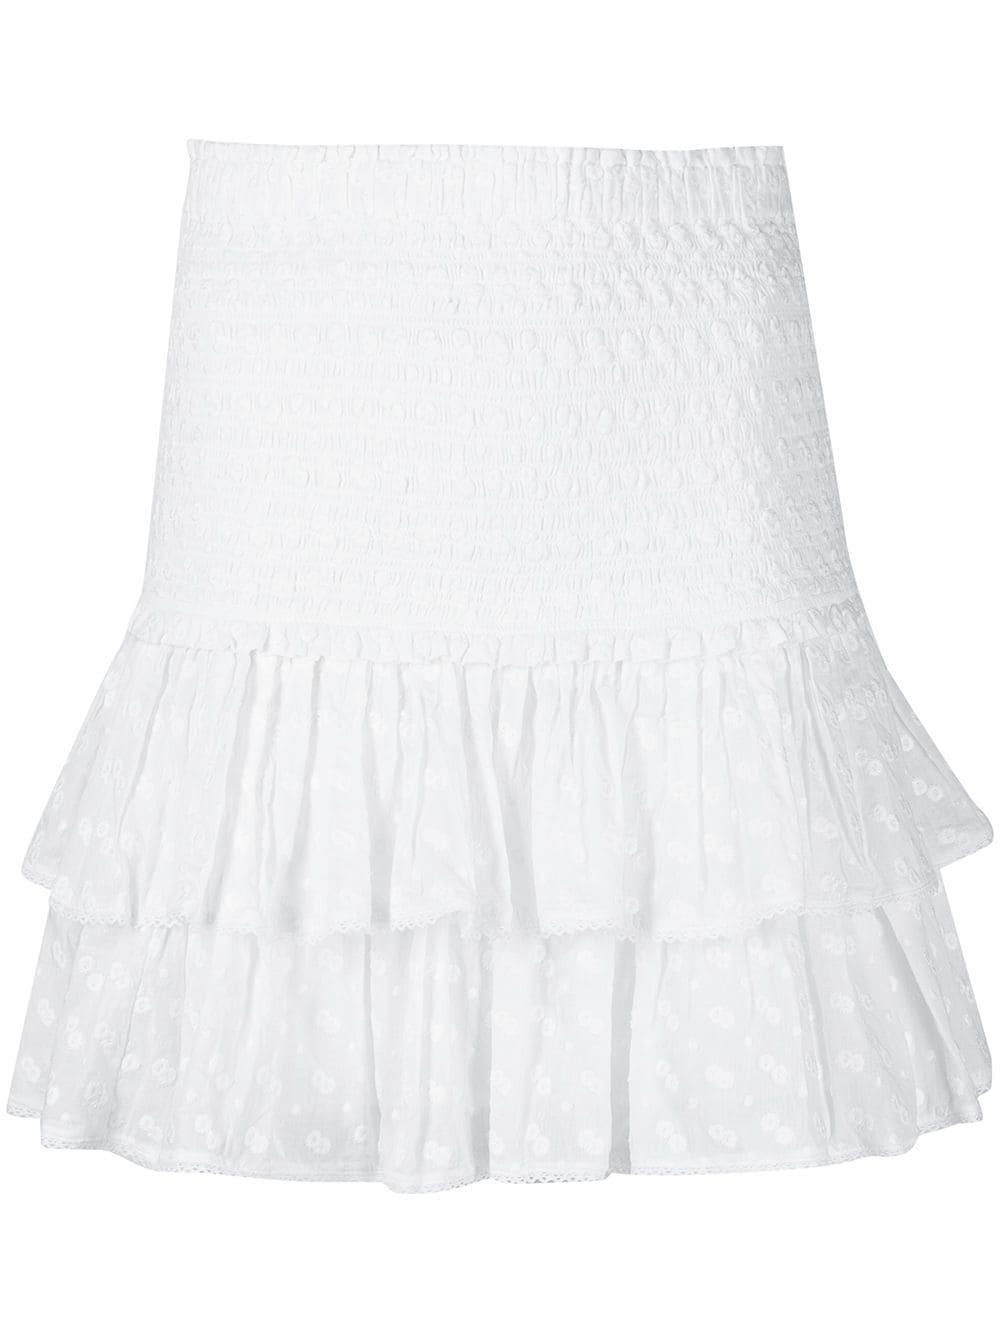 Tinaomi Embroidered Cotton Skirt